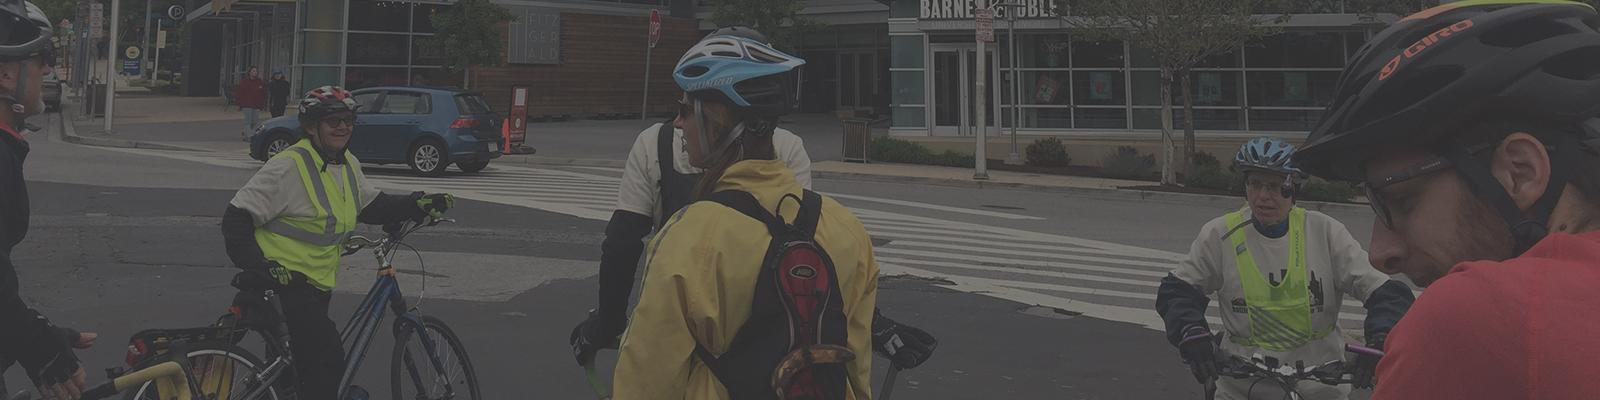 Urban Farm Bike Ride 2016